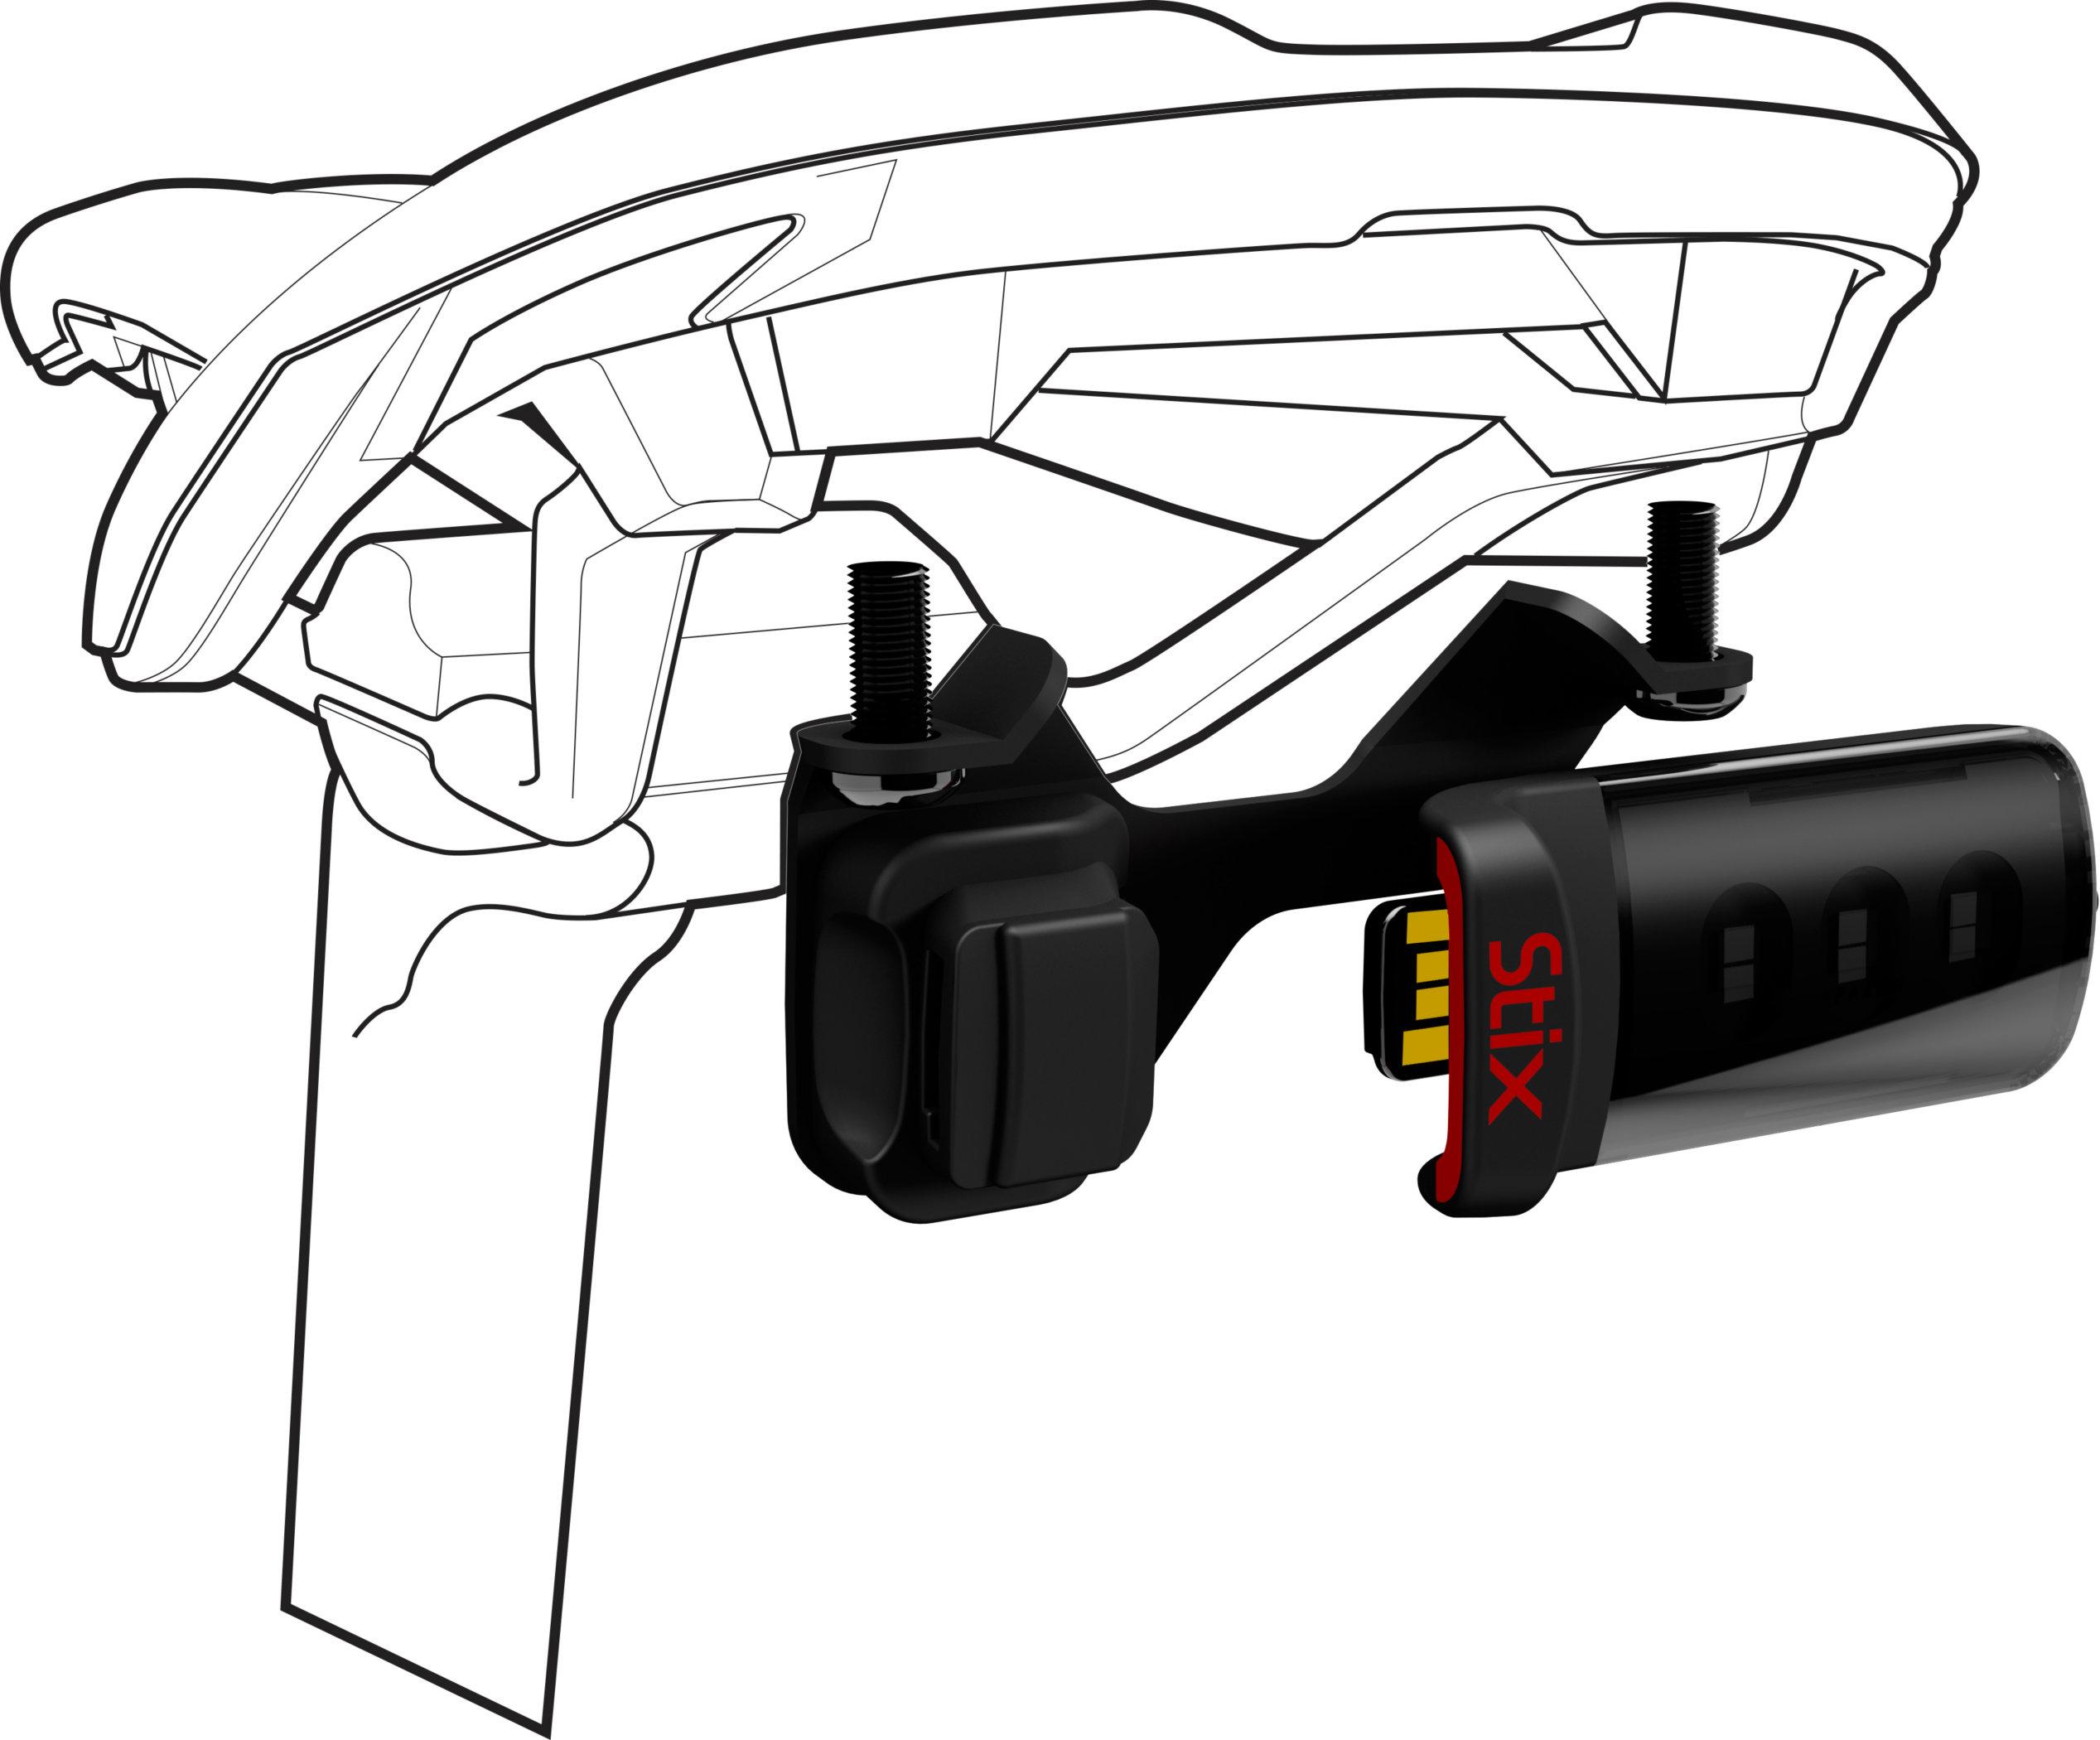 https://specializedconceptstore.co.uk/content/products/2017-stix-saddle-mount_5554.jpg